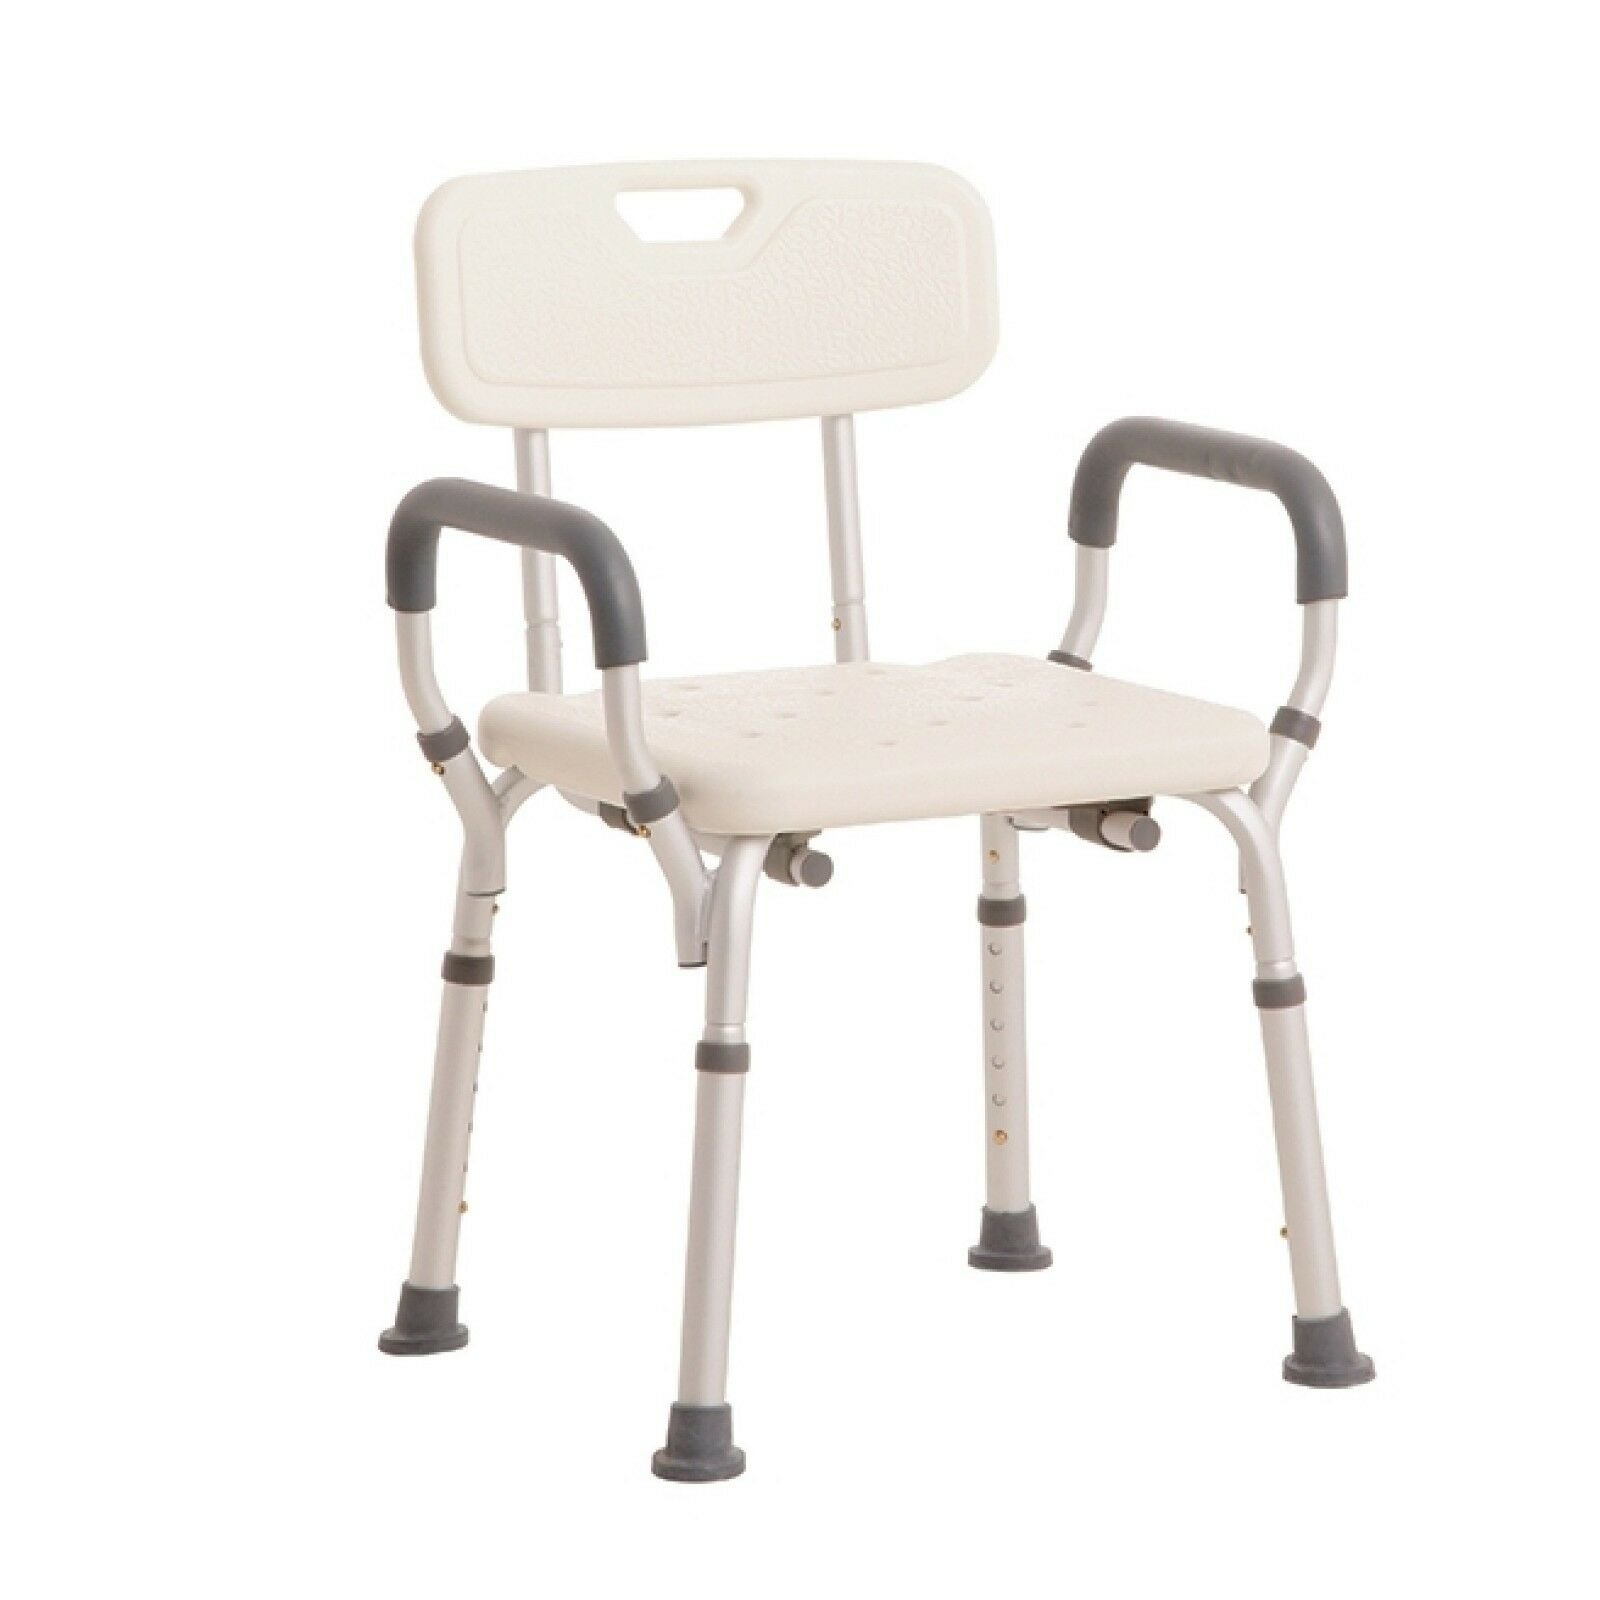 Mle Height Adjustable Shower Chair Aluminium Bathroom Aid With Back Arms